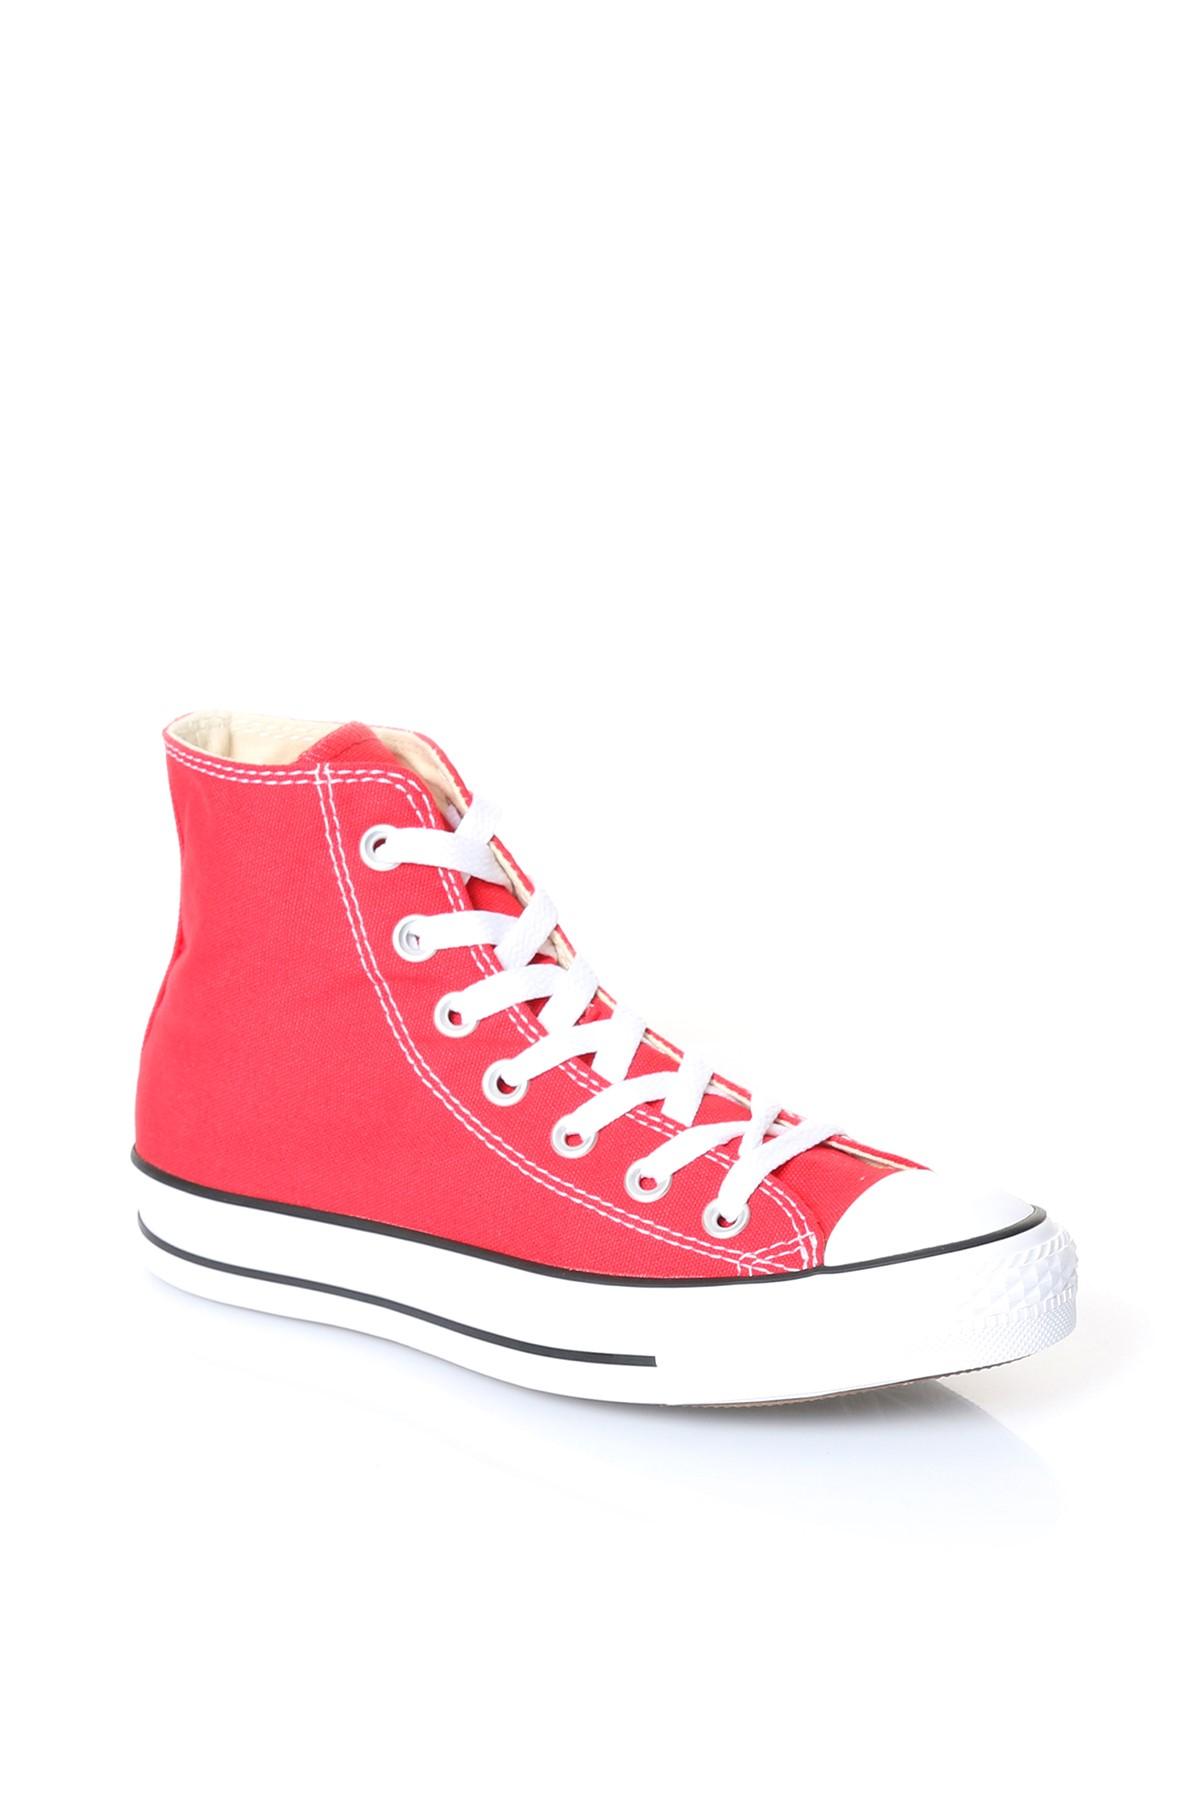 converse Unisex Sneaker M9621C CHUCK TAYLOR ALL STAR  - M9621C 1